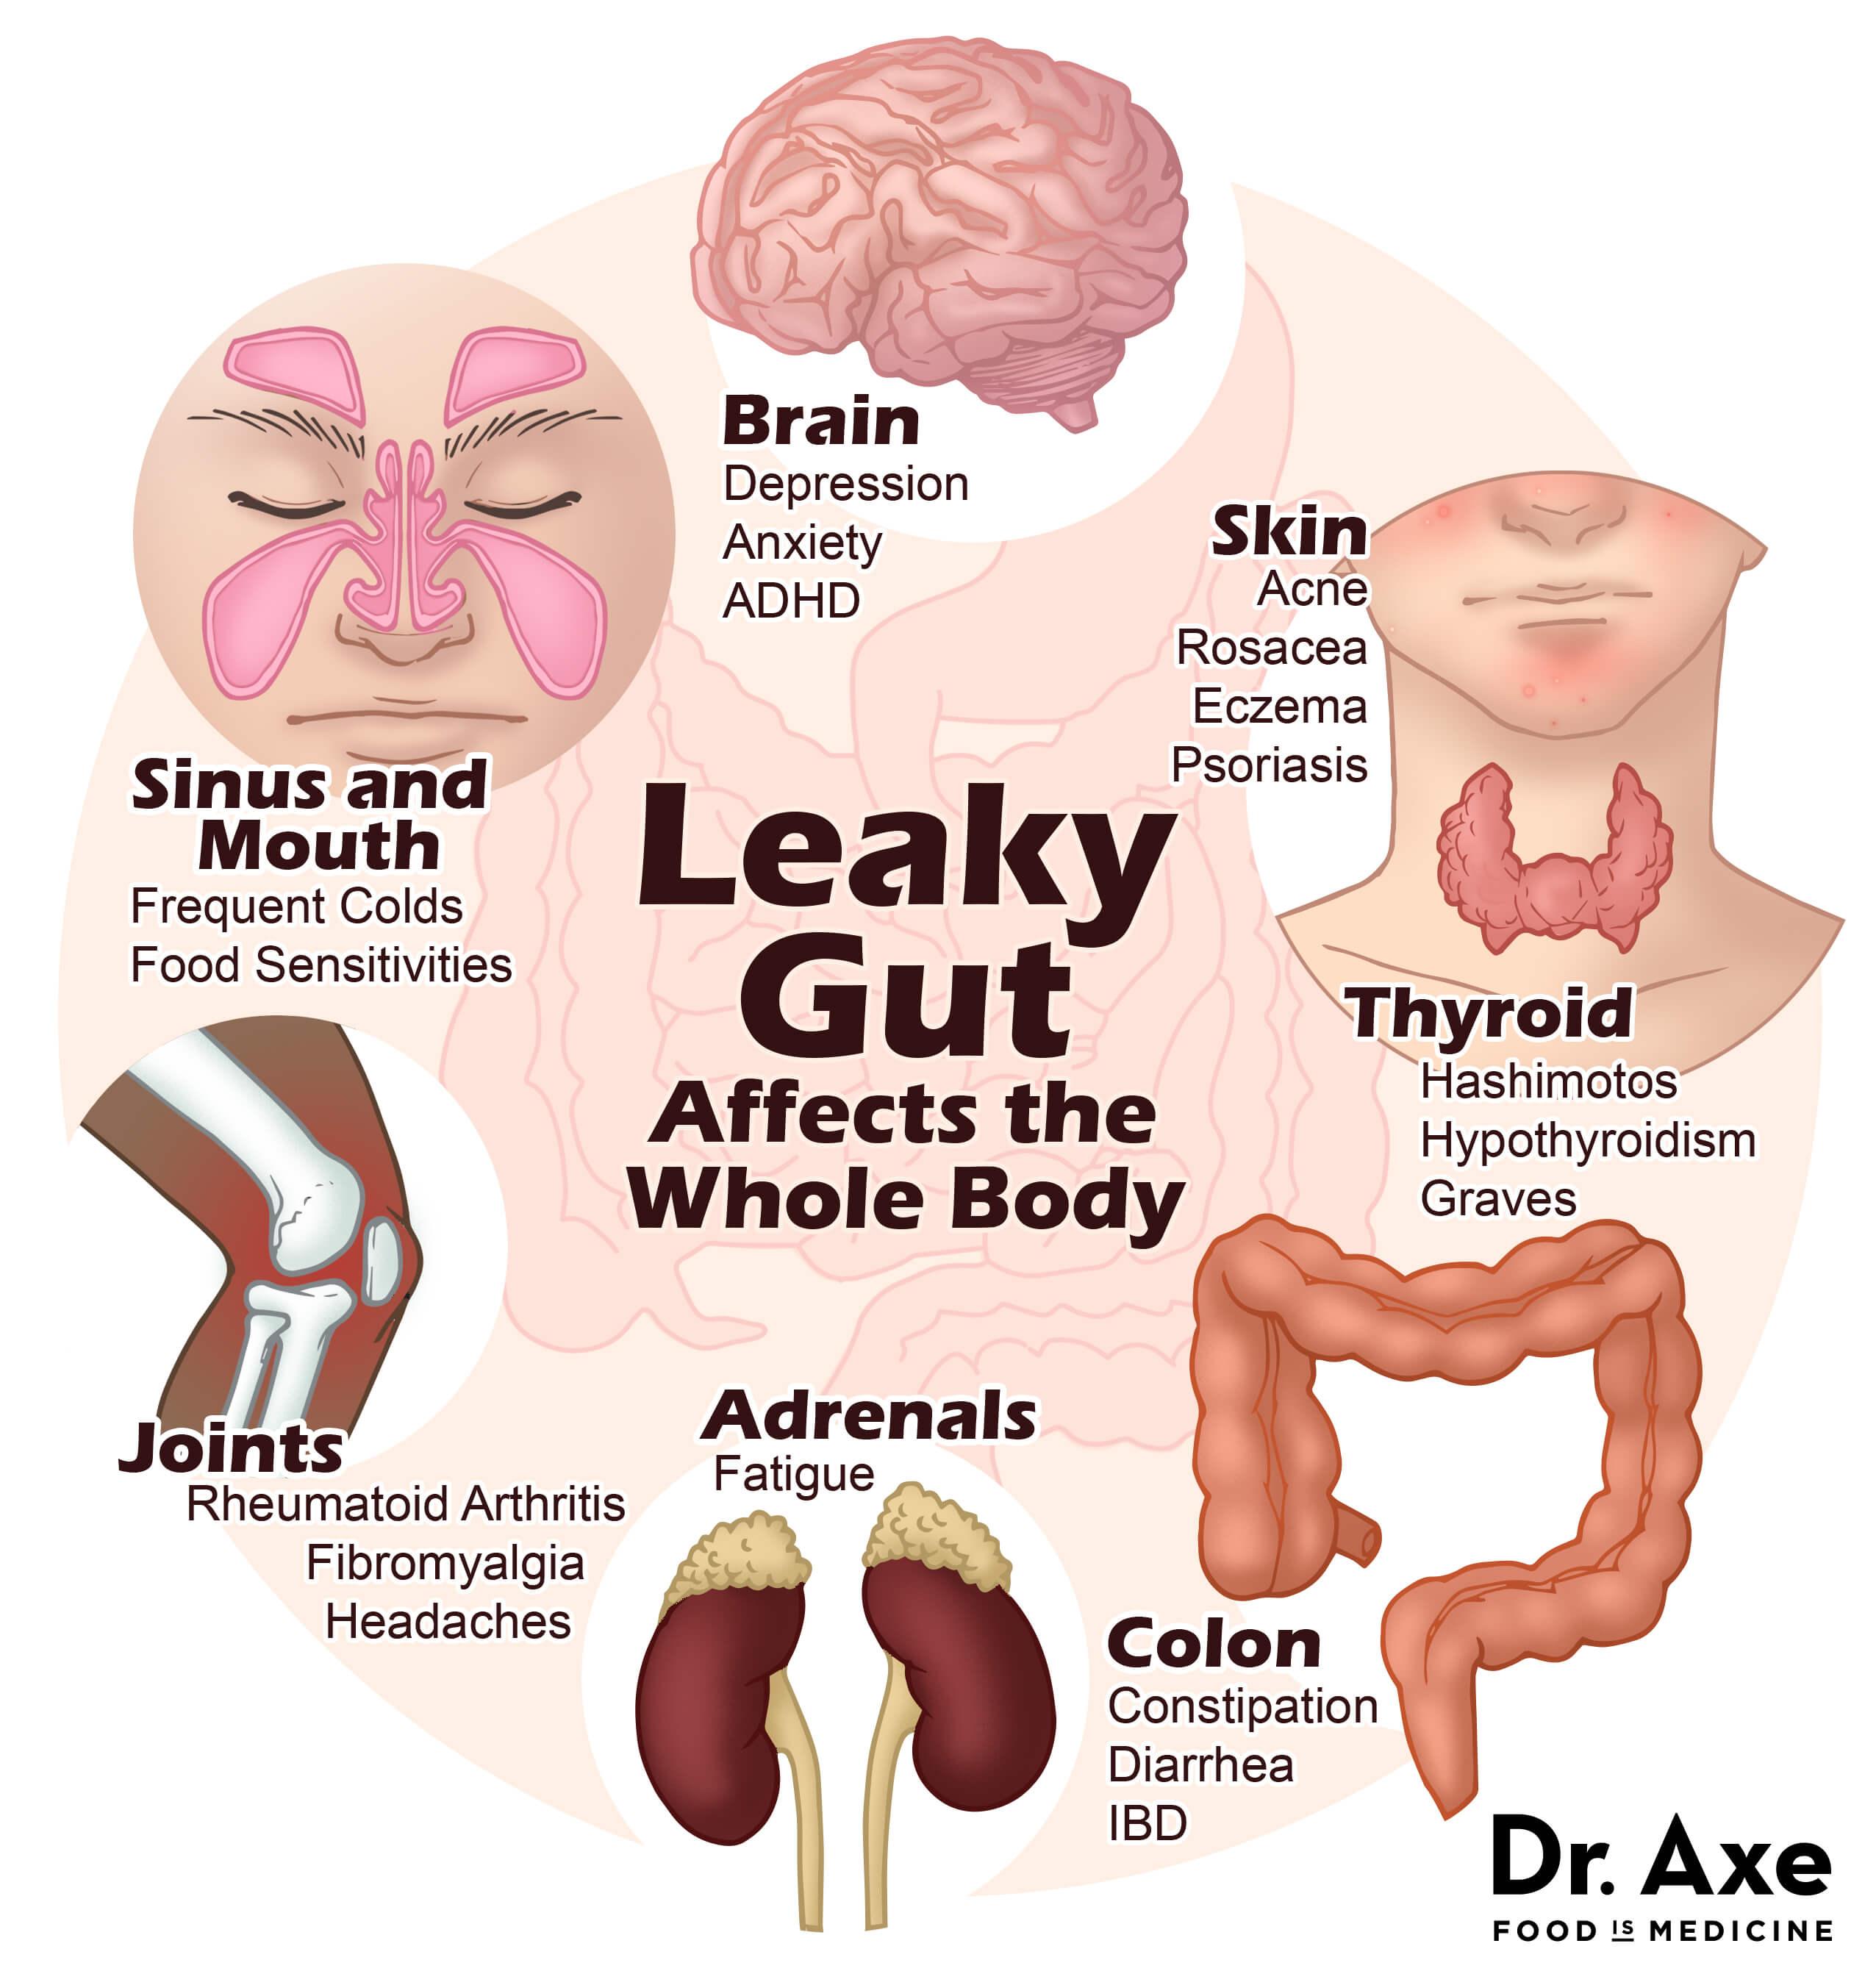 leaky gut syndrome symptoms diagram